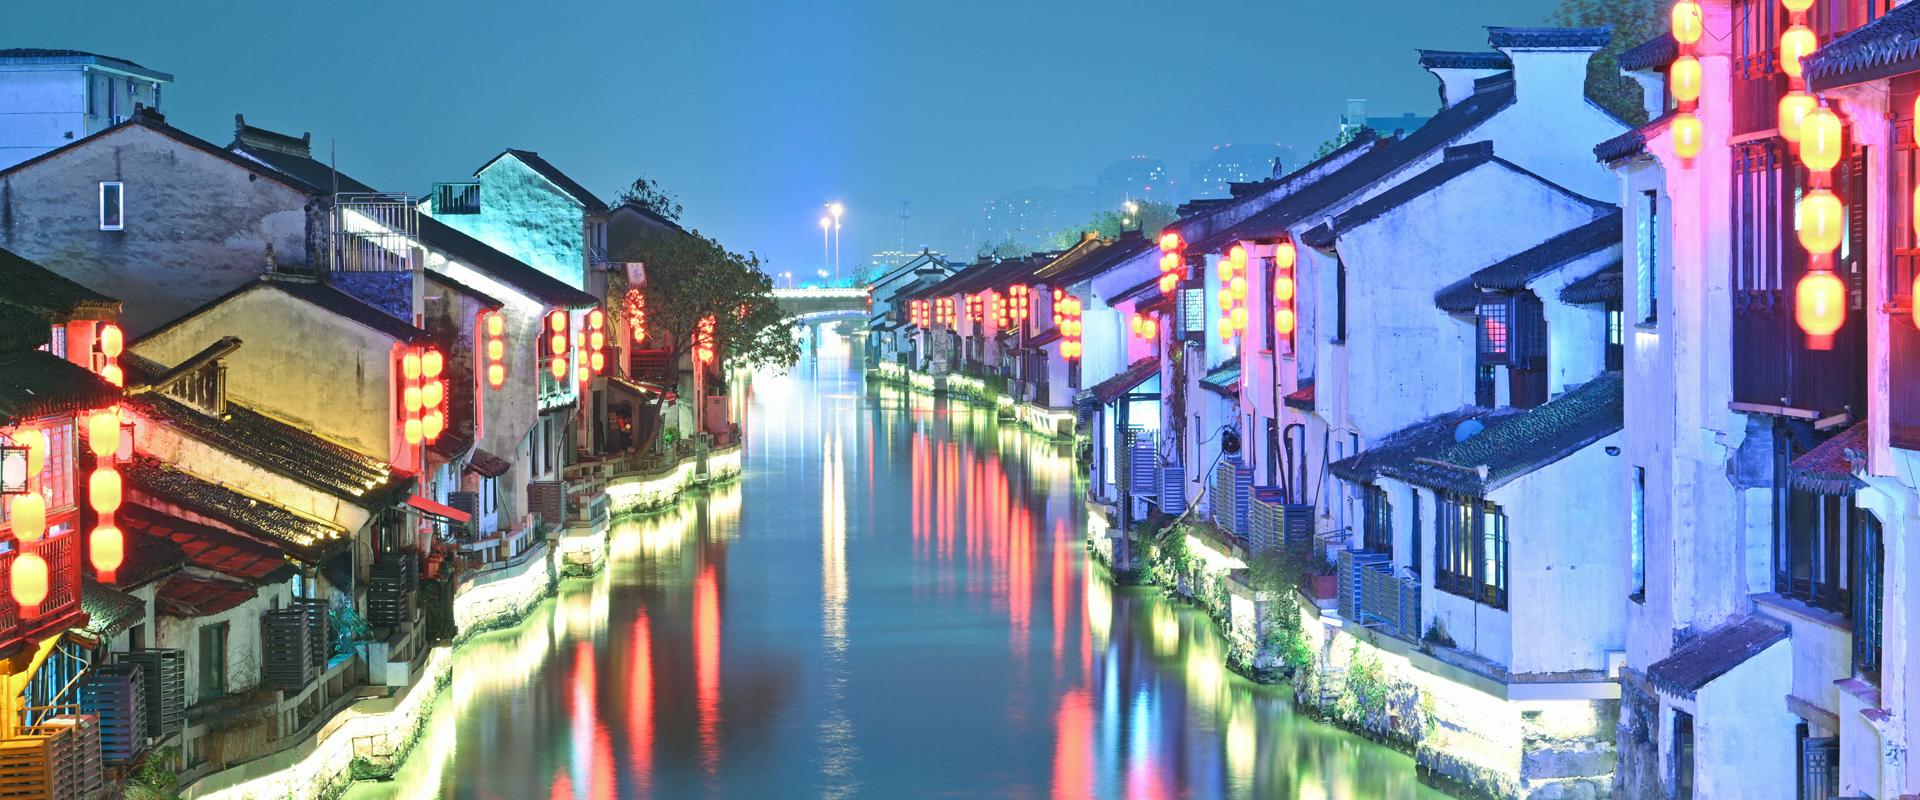 Stunning night views of Nanchang Street in Wuxi